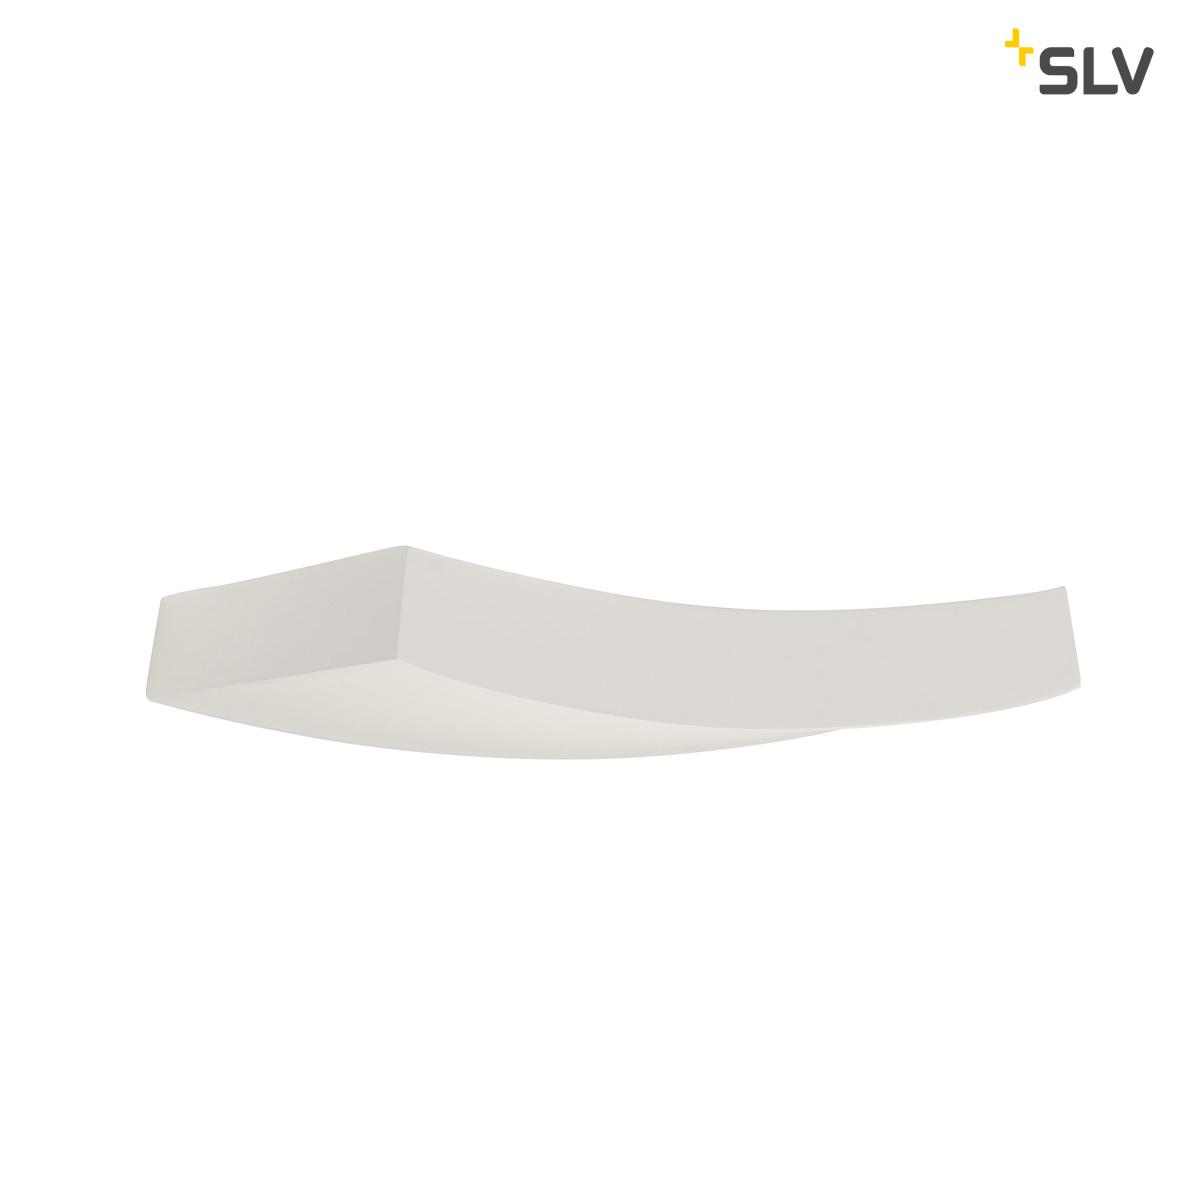 SLV - GL 102 Curve